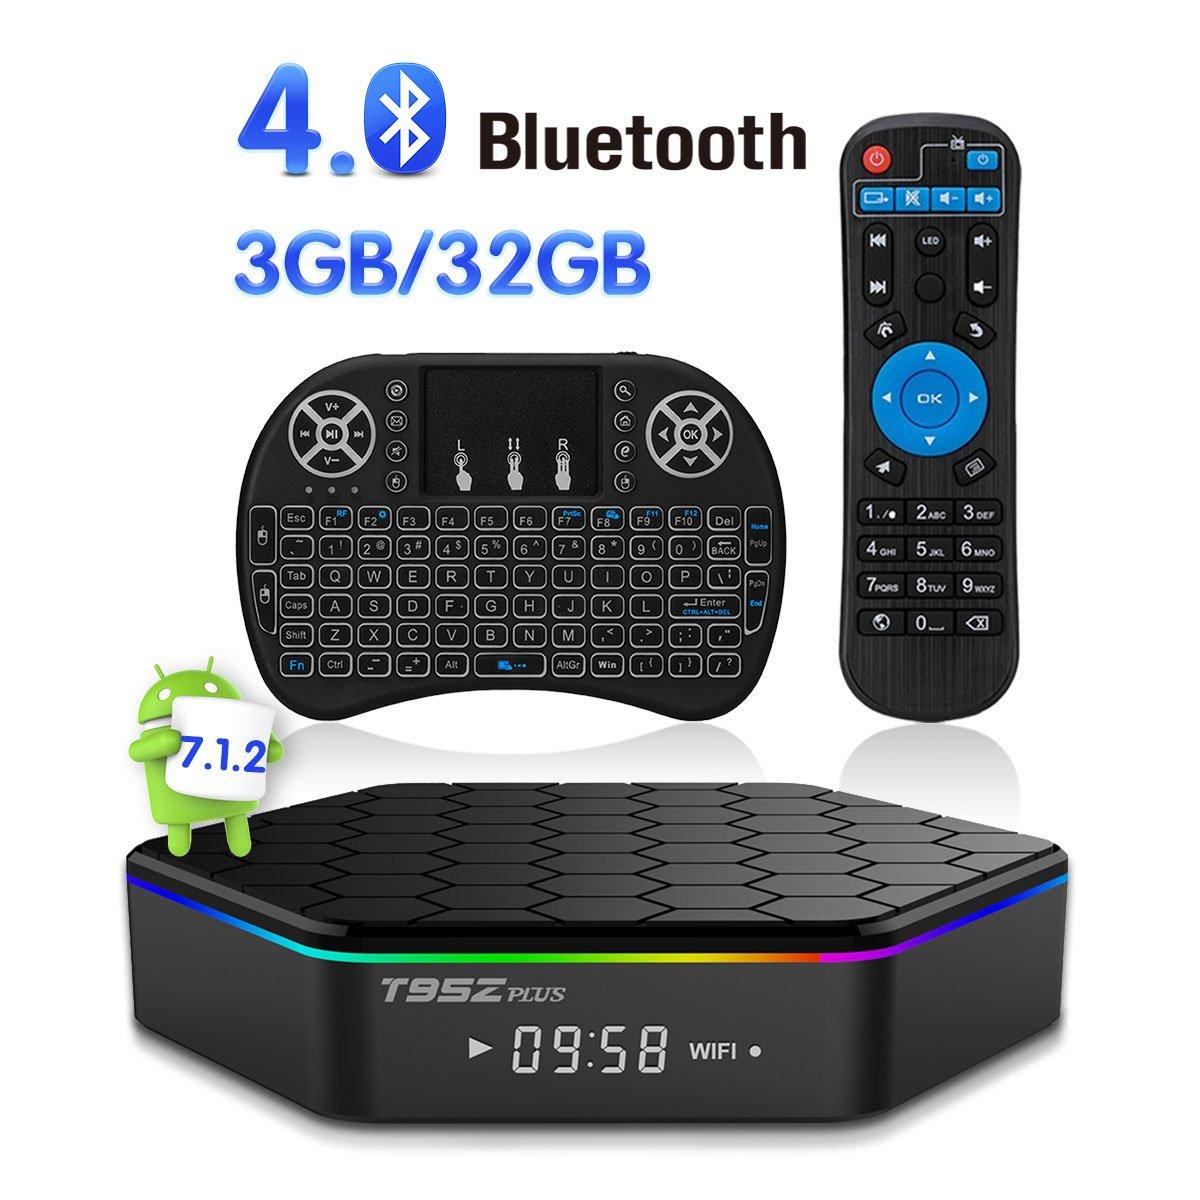 TRUEWELL T95Z Plus TV Box Android 7.1 Amlogic S912 3GB/32GB Octa Core 4K Video Player Dual WiFi 2.4/5GHz Bluetooth 4.0 with Mini Wireless Keyboard CJW